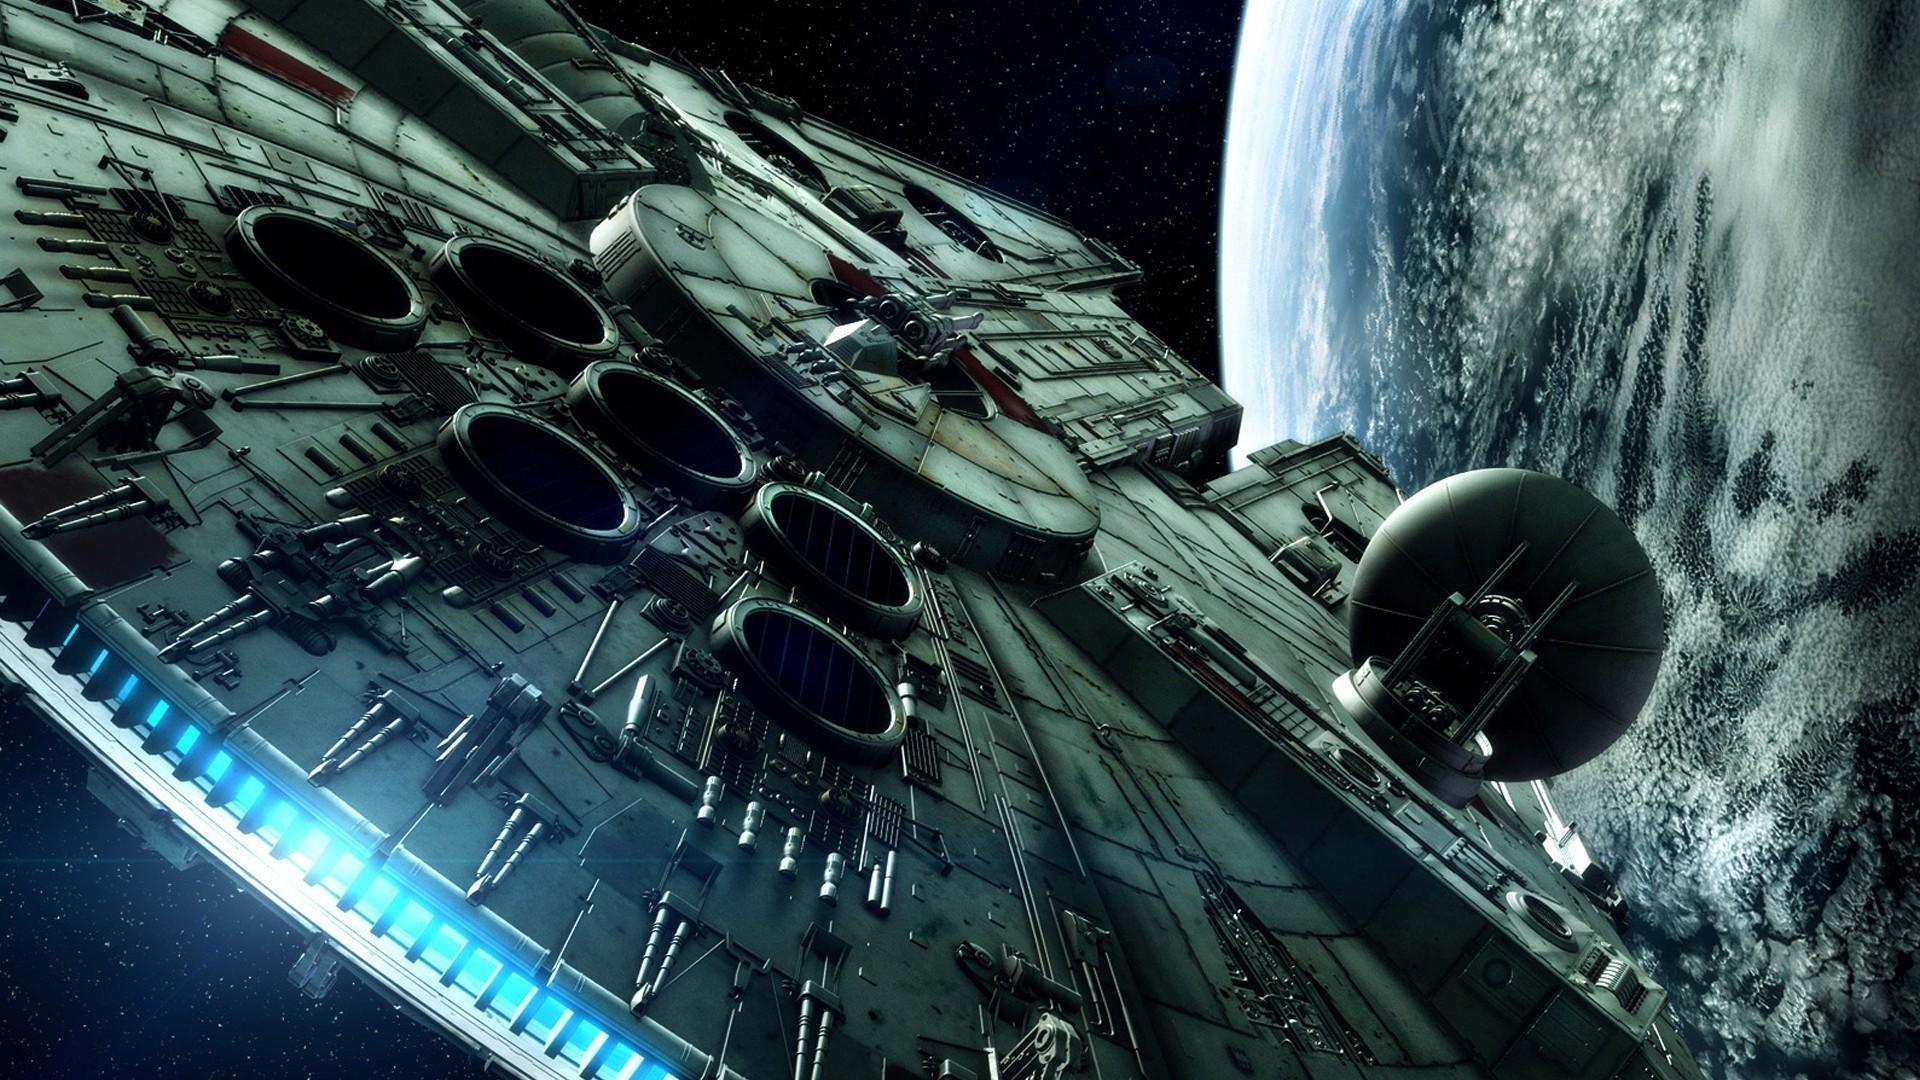 the-millenium-falcon-star-wars-5834